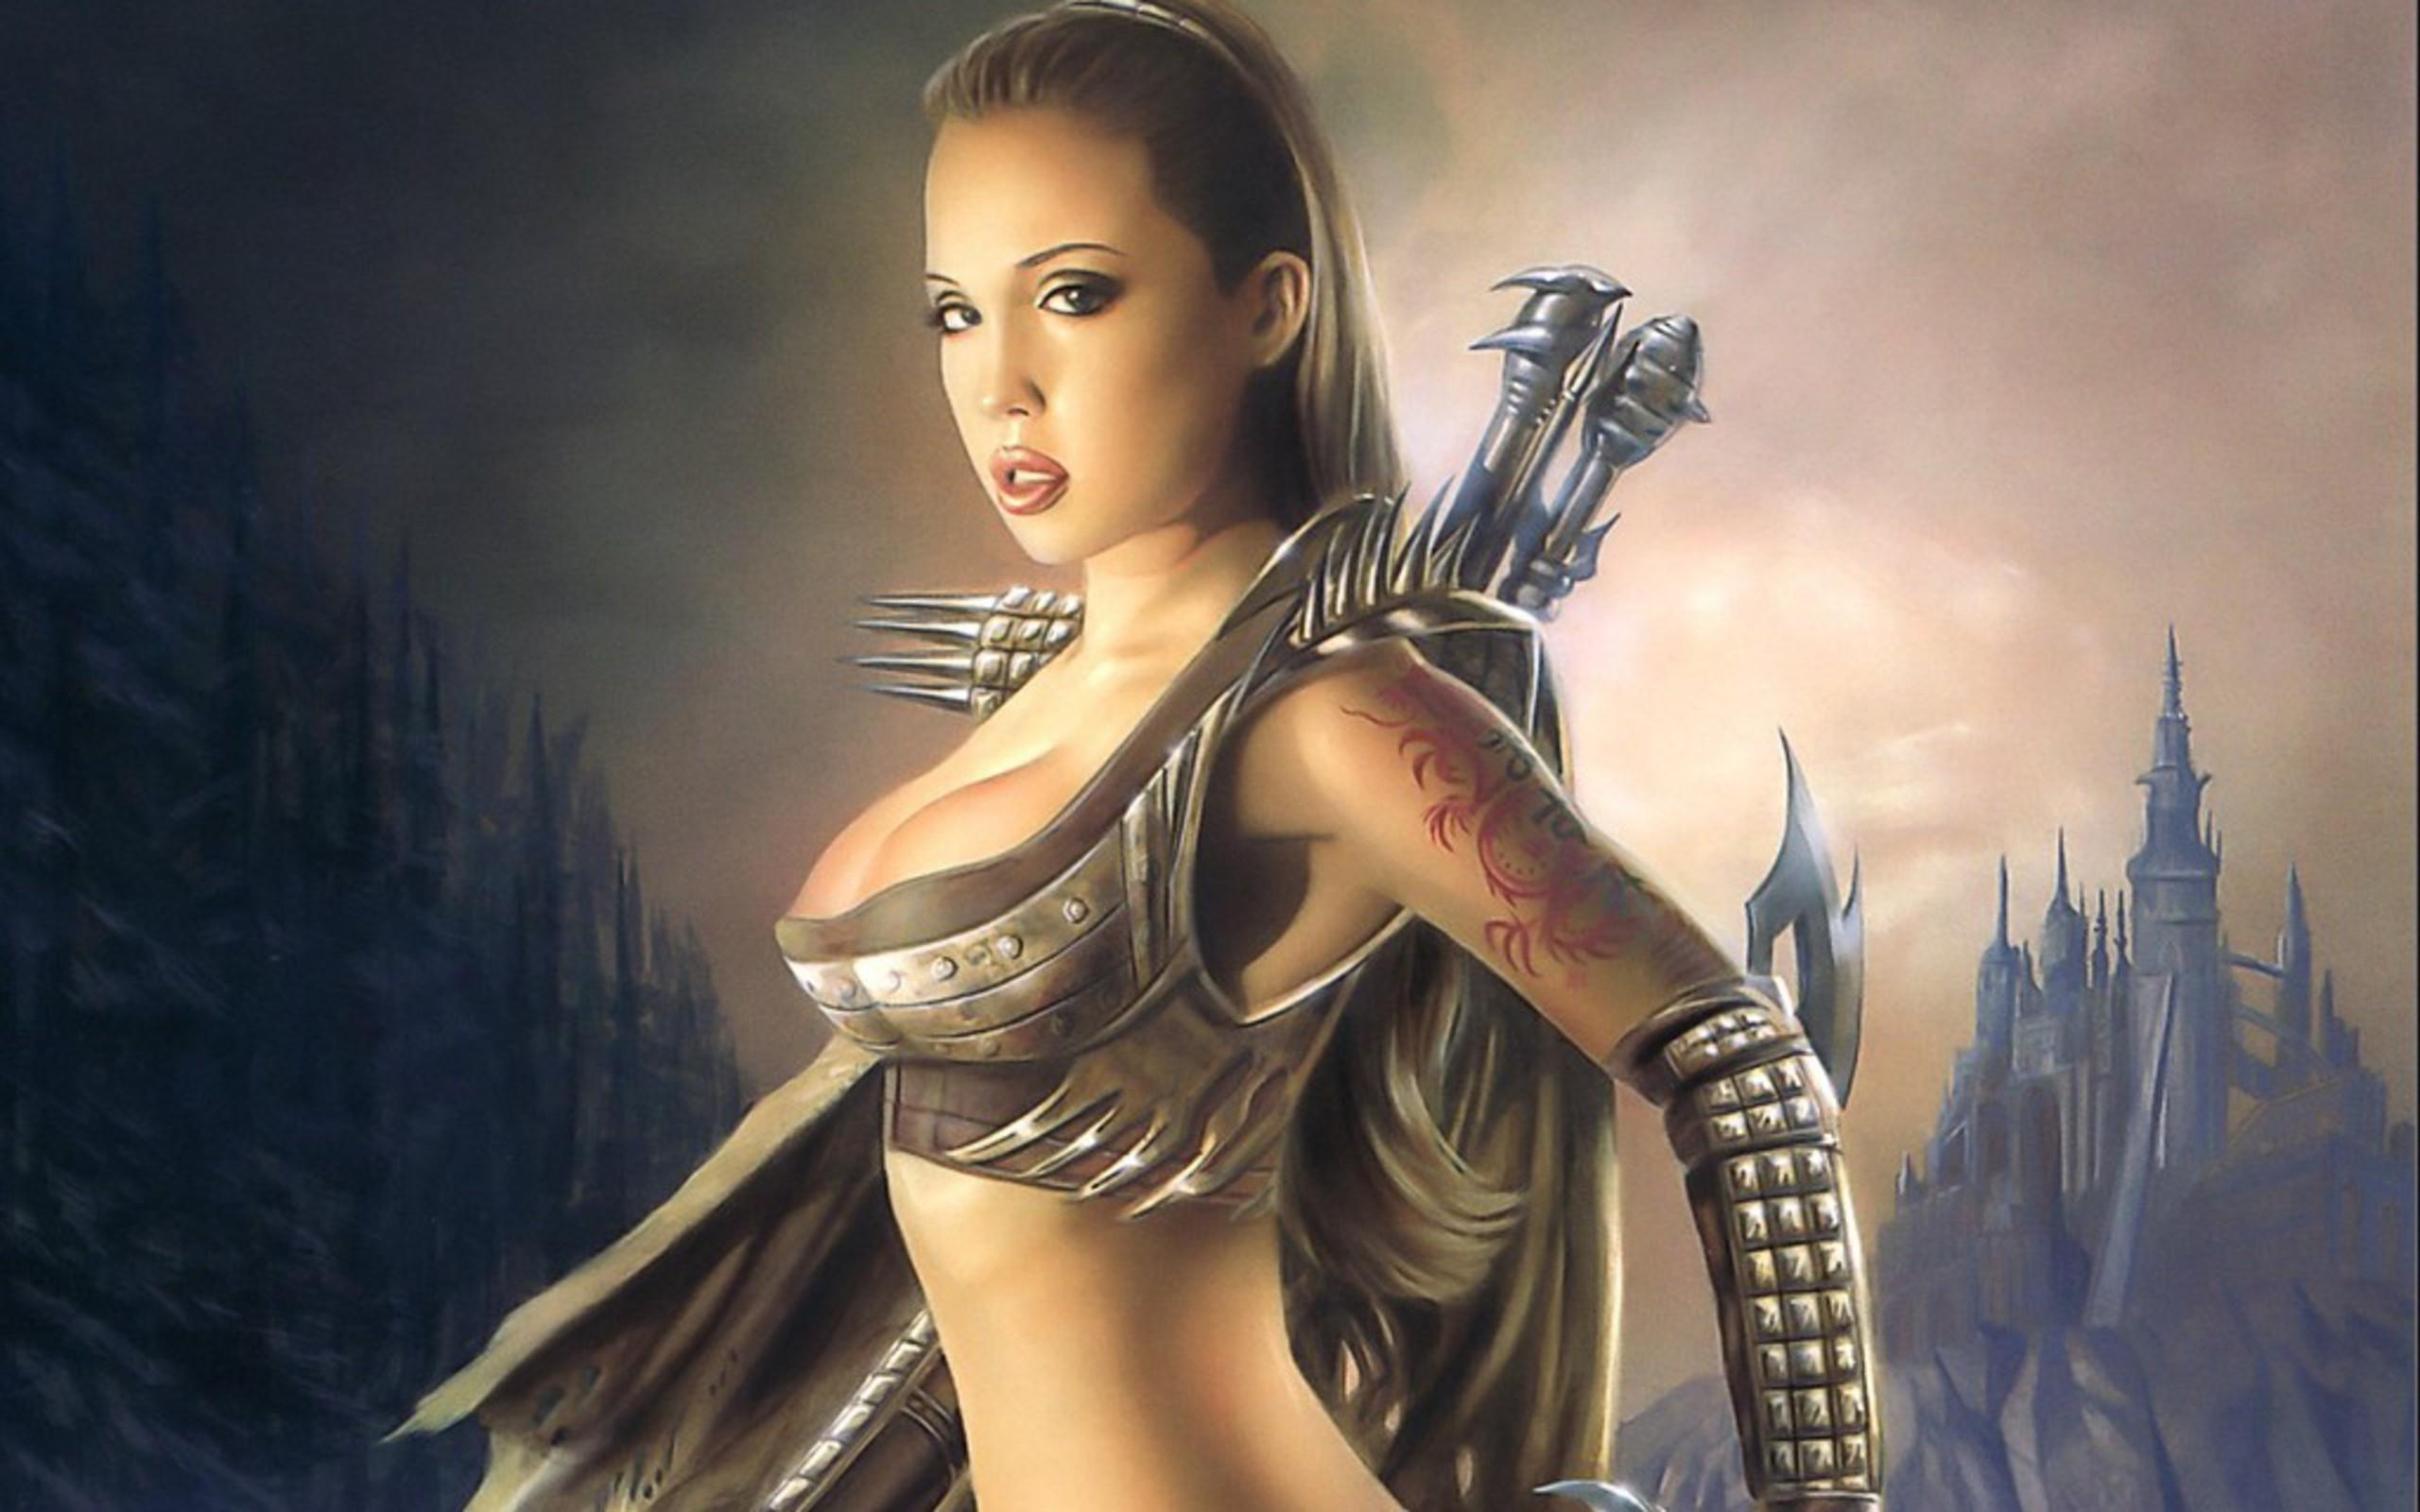 Fantasy warrior women wallpaper 78 images 3000x2151 fantasy women warrior wallpaper voltagebd Images